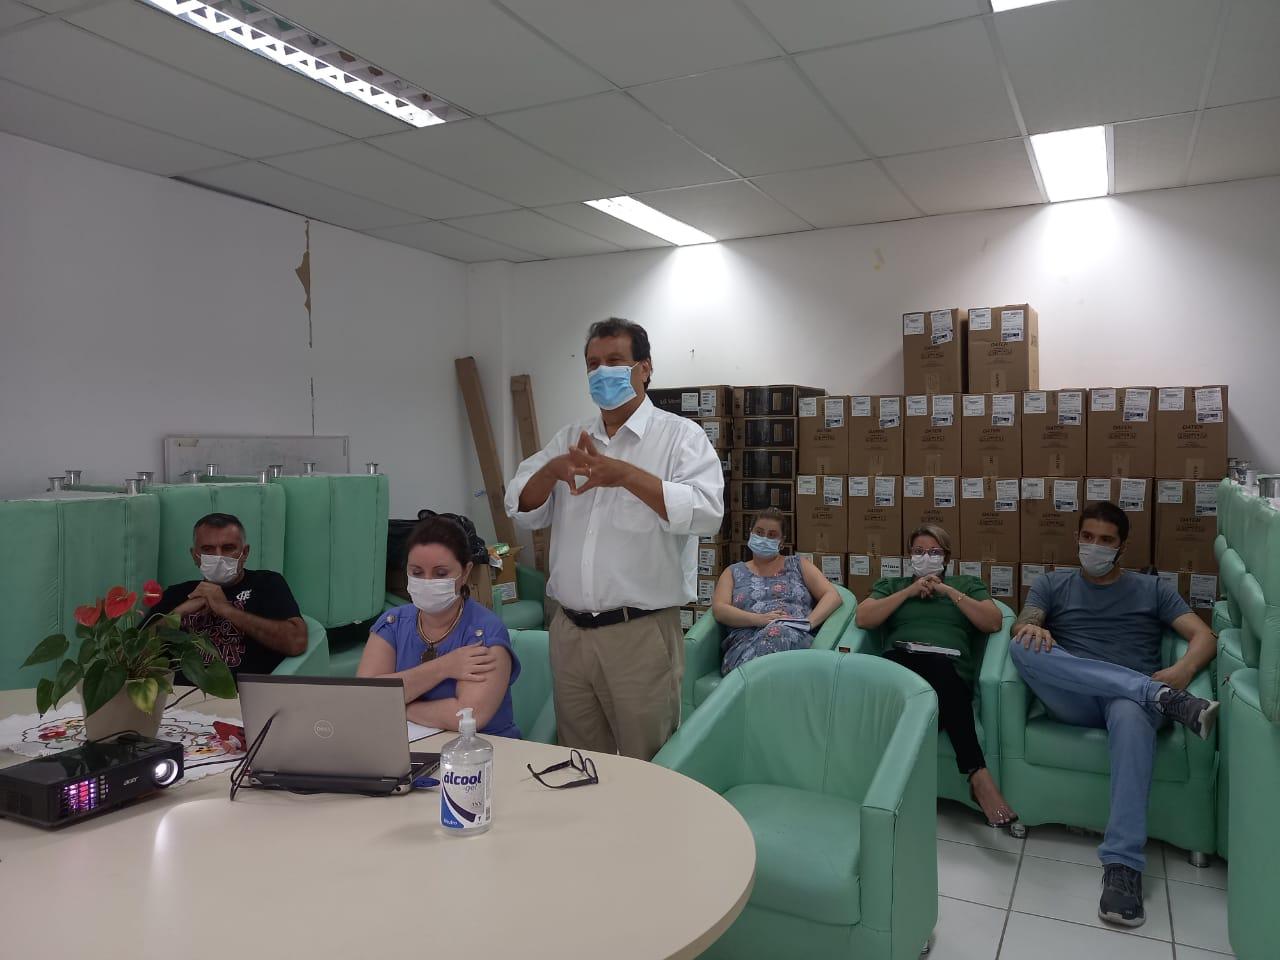 Plano de contingência do coronavírus será elaborado para enfrentamento da COVID-19